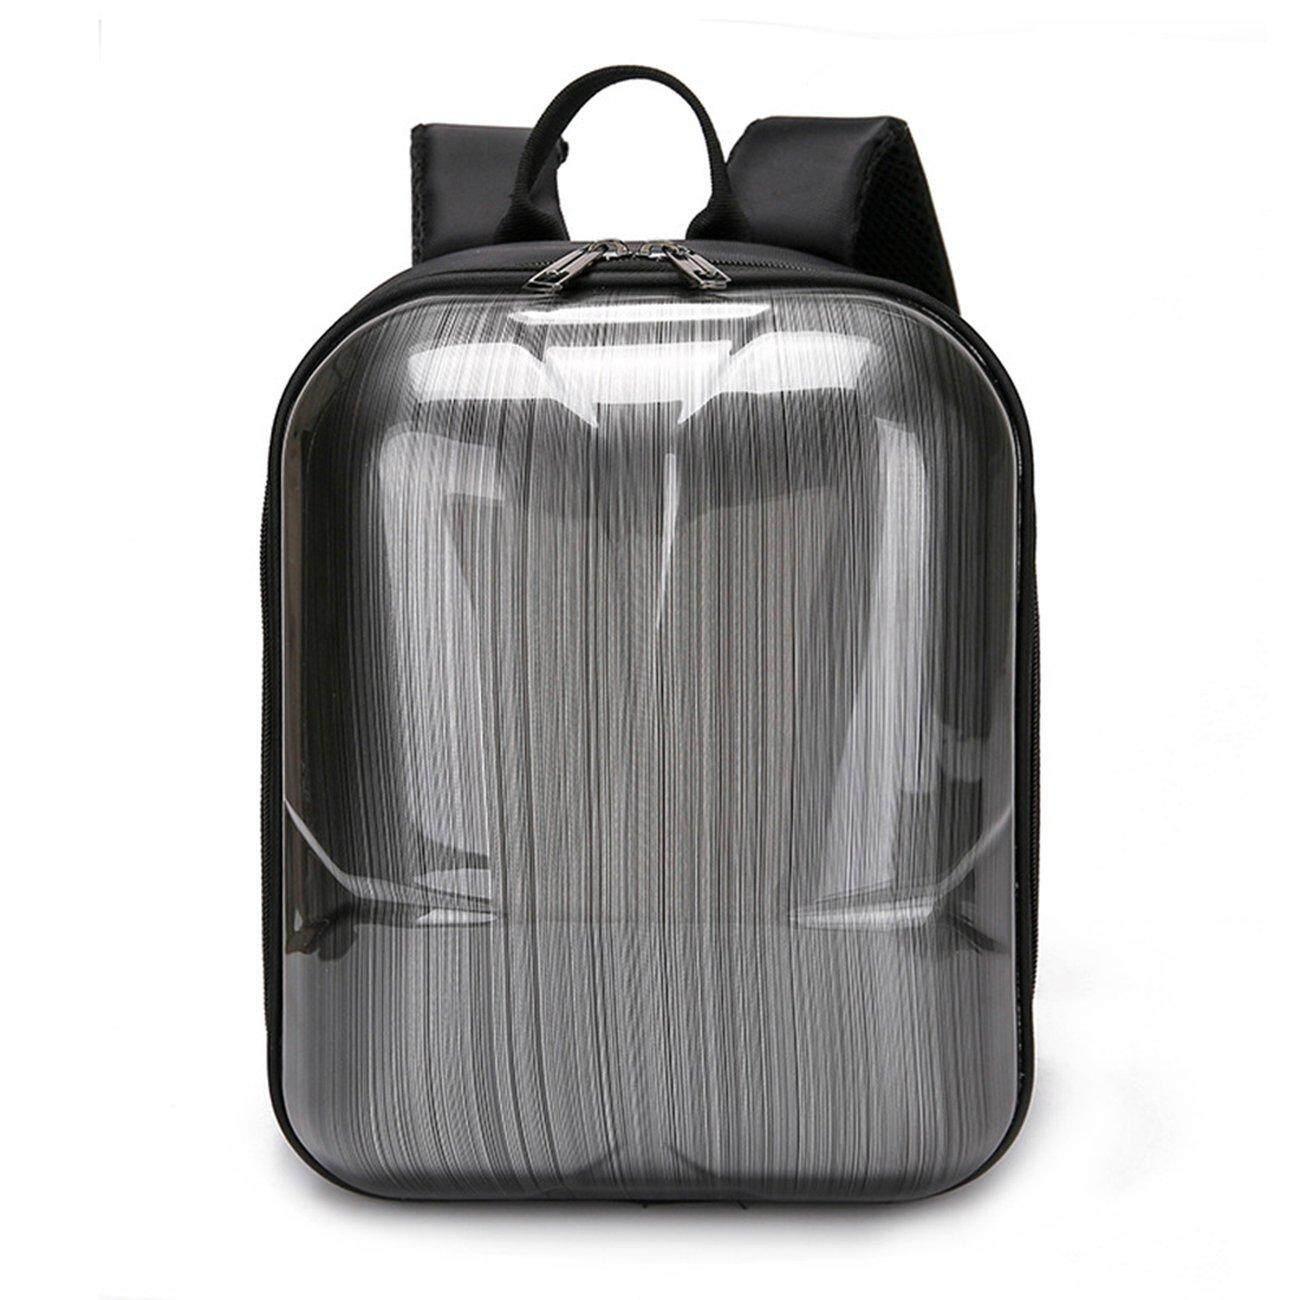 UINN Drone Storage Bag Waterproof Turtle Shell Bag All-Round Suit Bag